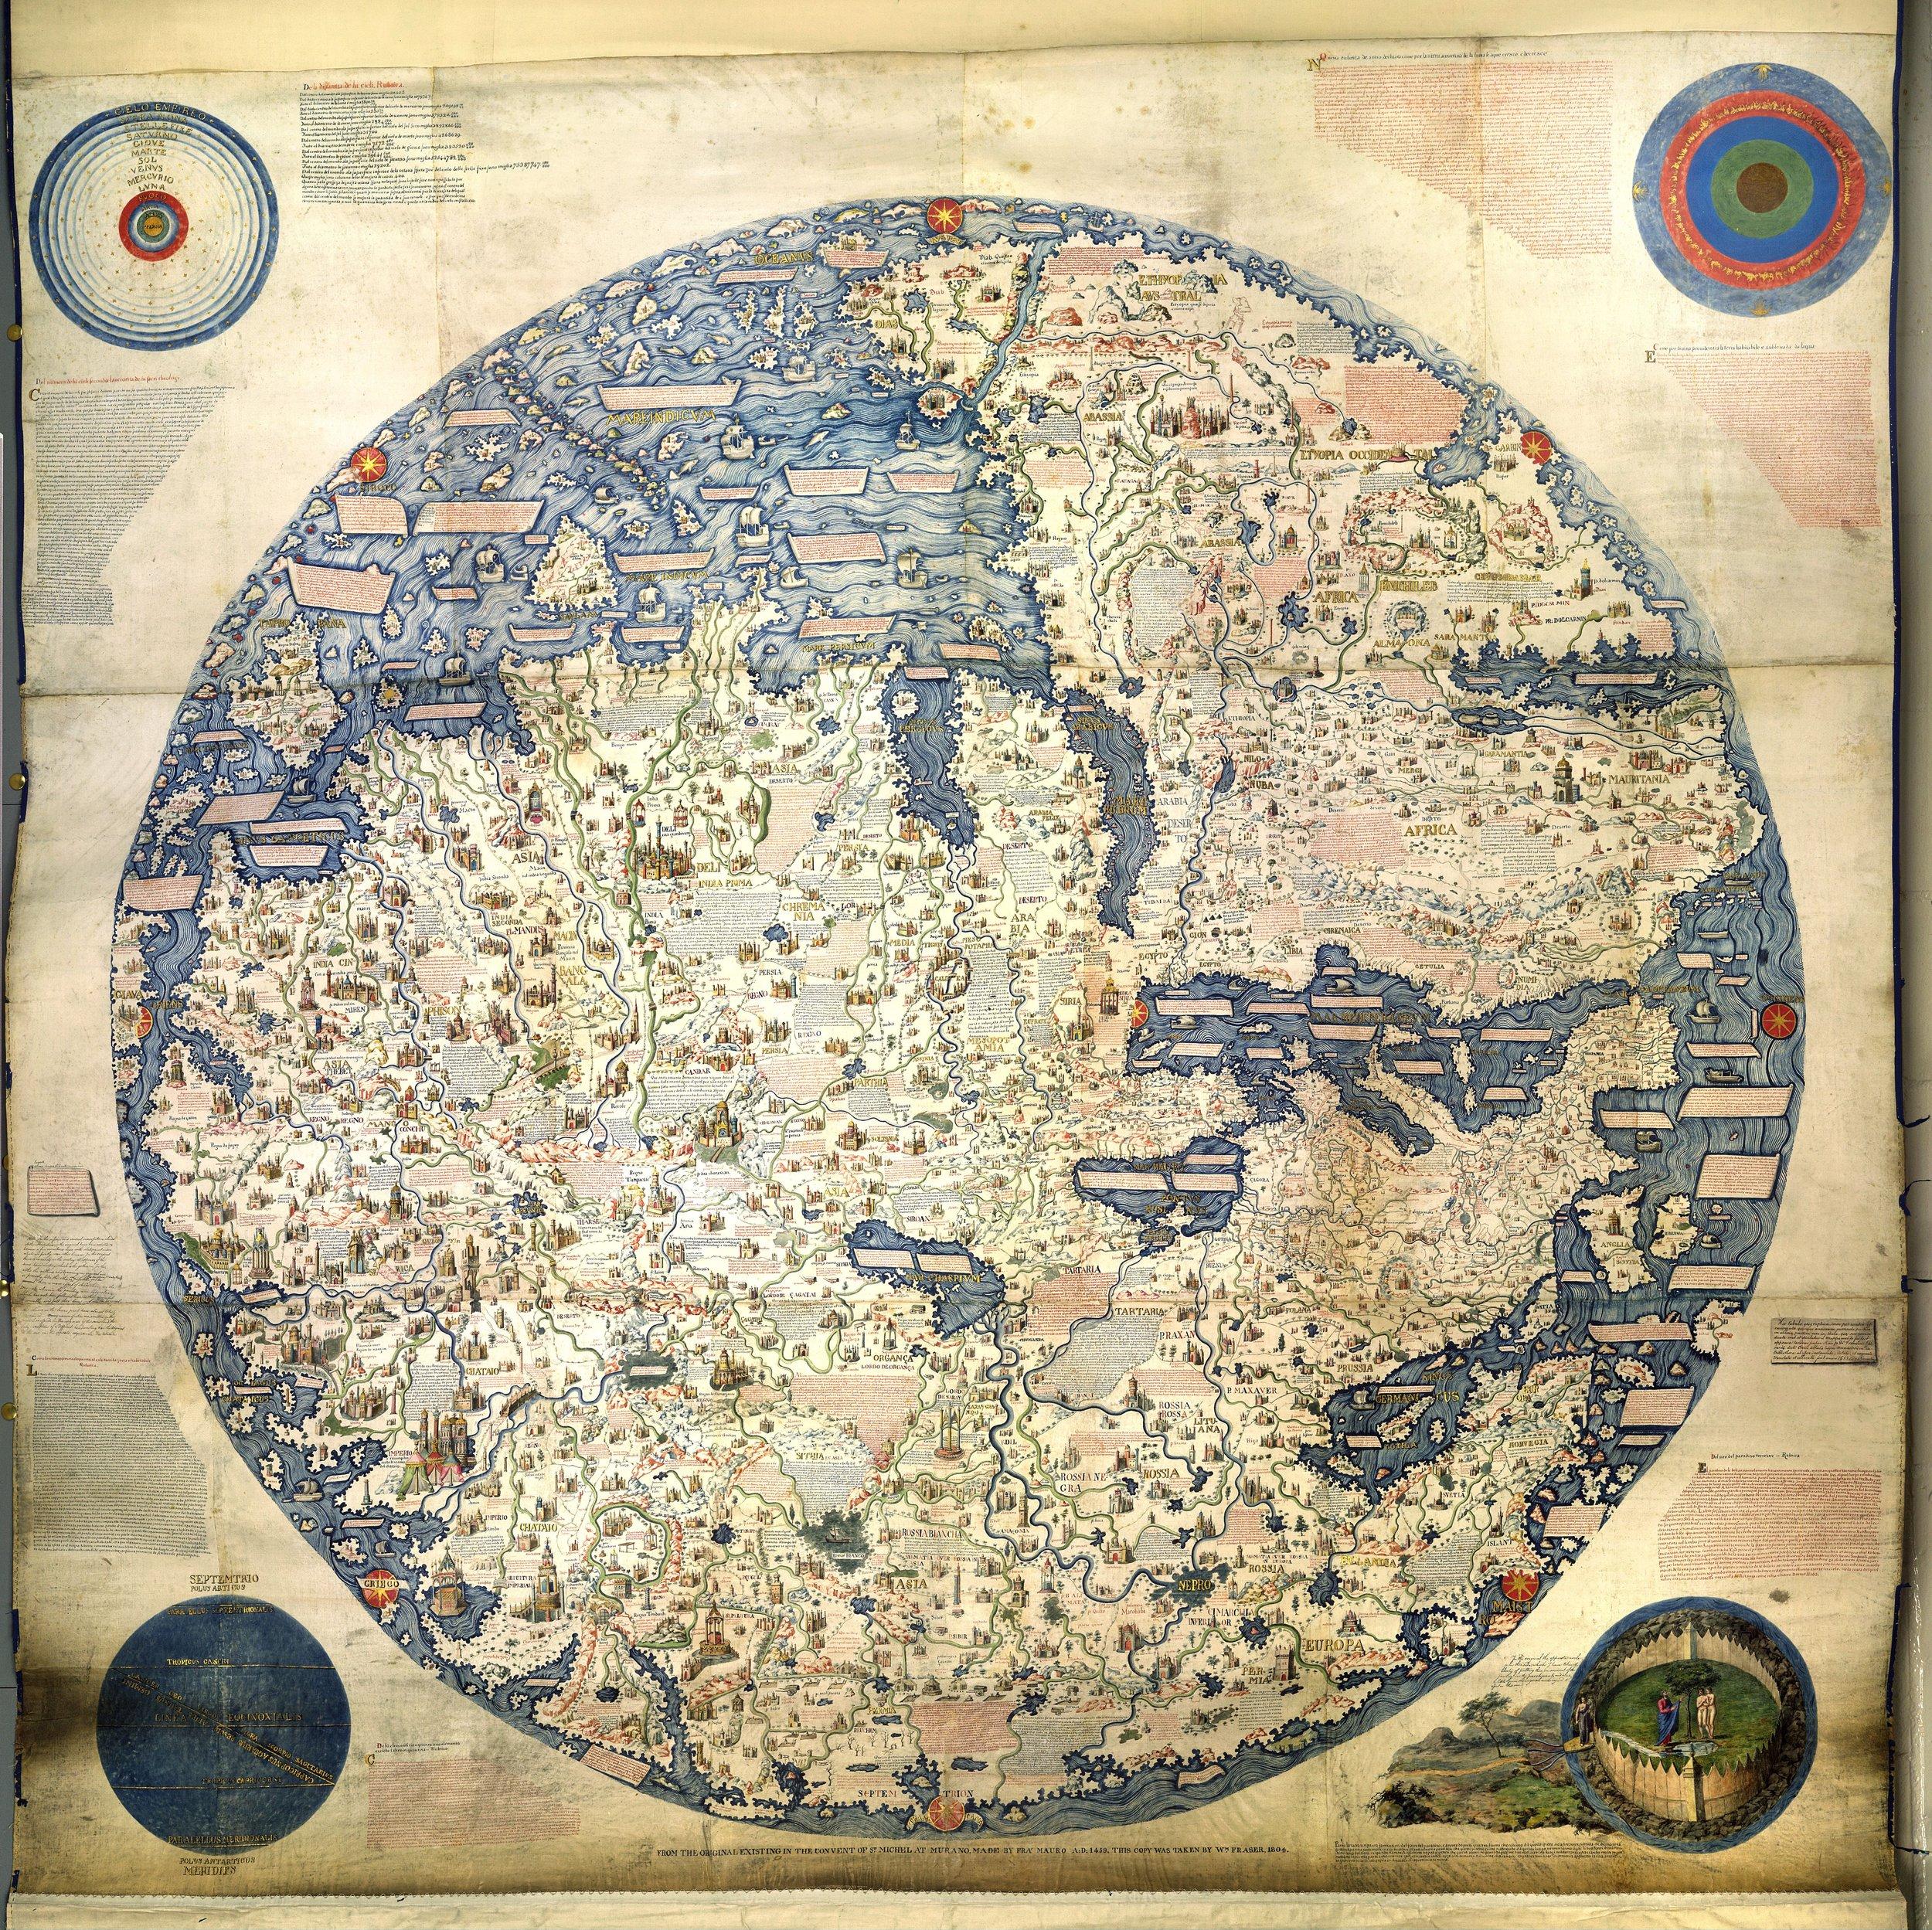 Fra Mauro's world map. Photo credit: Public Domain  https://upload.wikimedia.org/wikipedia/commons/9/95/Fra_Mauro_World_Map%2C_c.1450.jpg